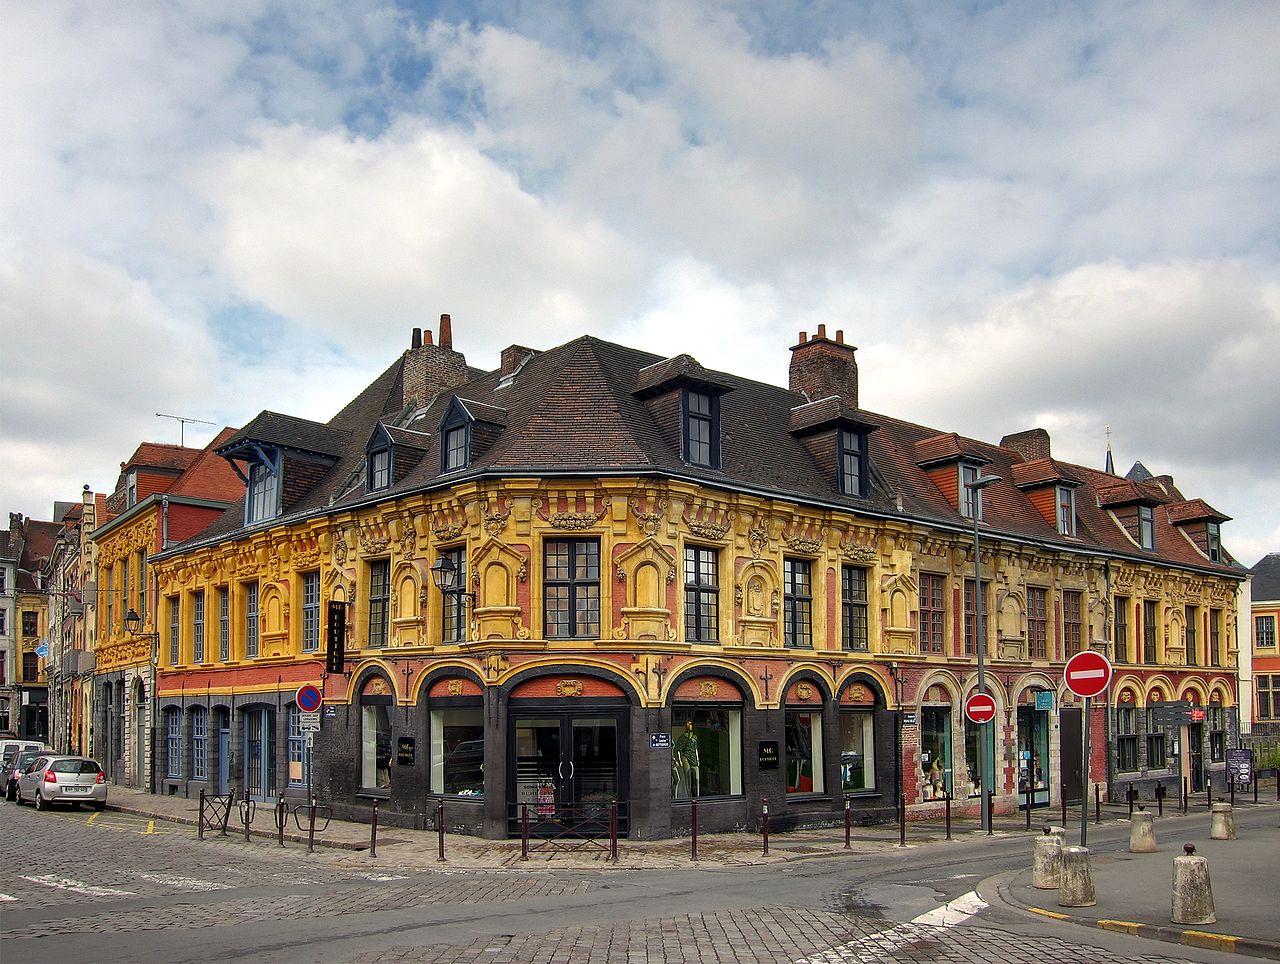 File:Lille maison gilles de la boe bis.jpg - Wikimedia Commons